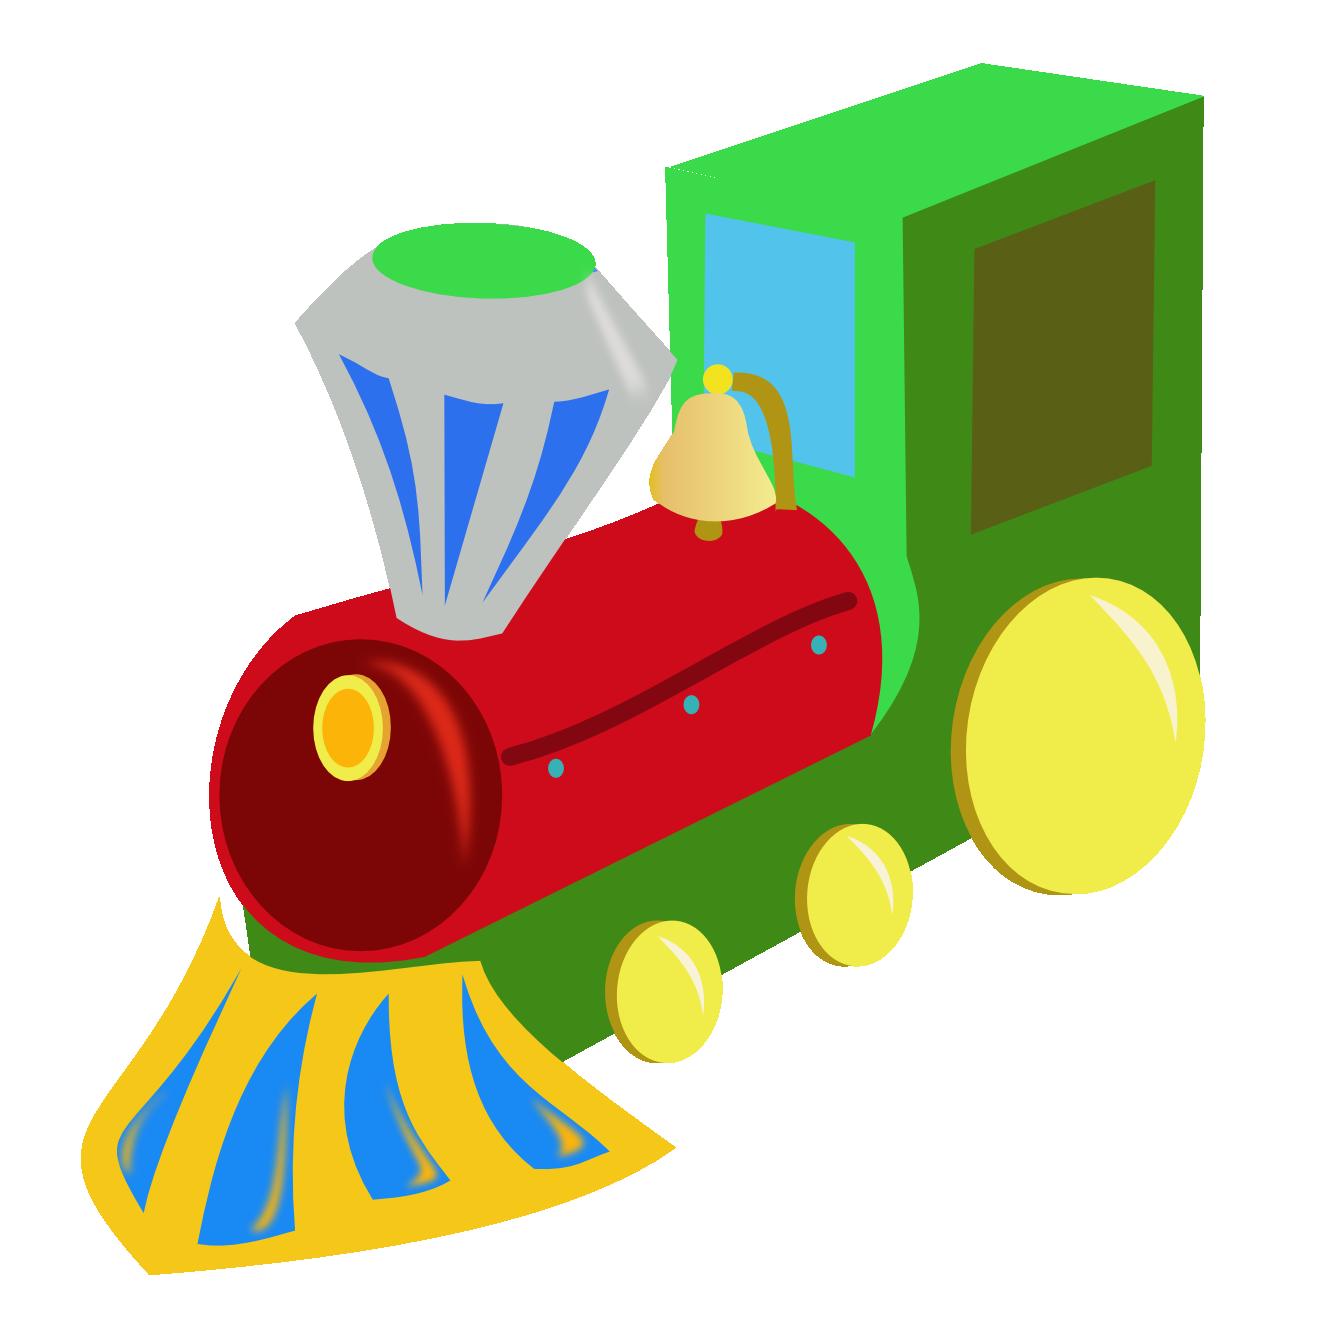 Dweeb Tren Train Coloring Book .-Dweeb Tren Train Coloring Book .-7